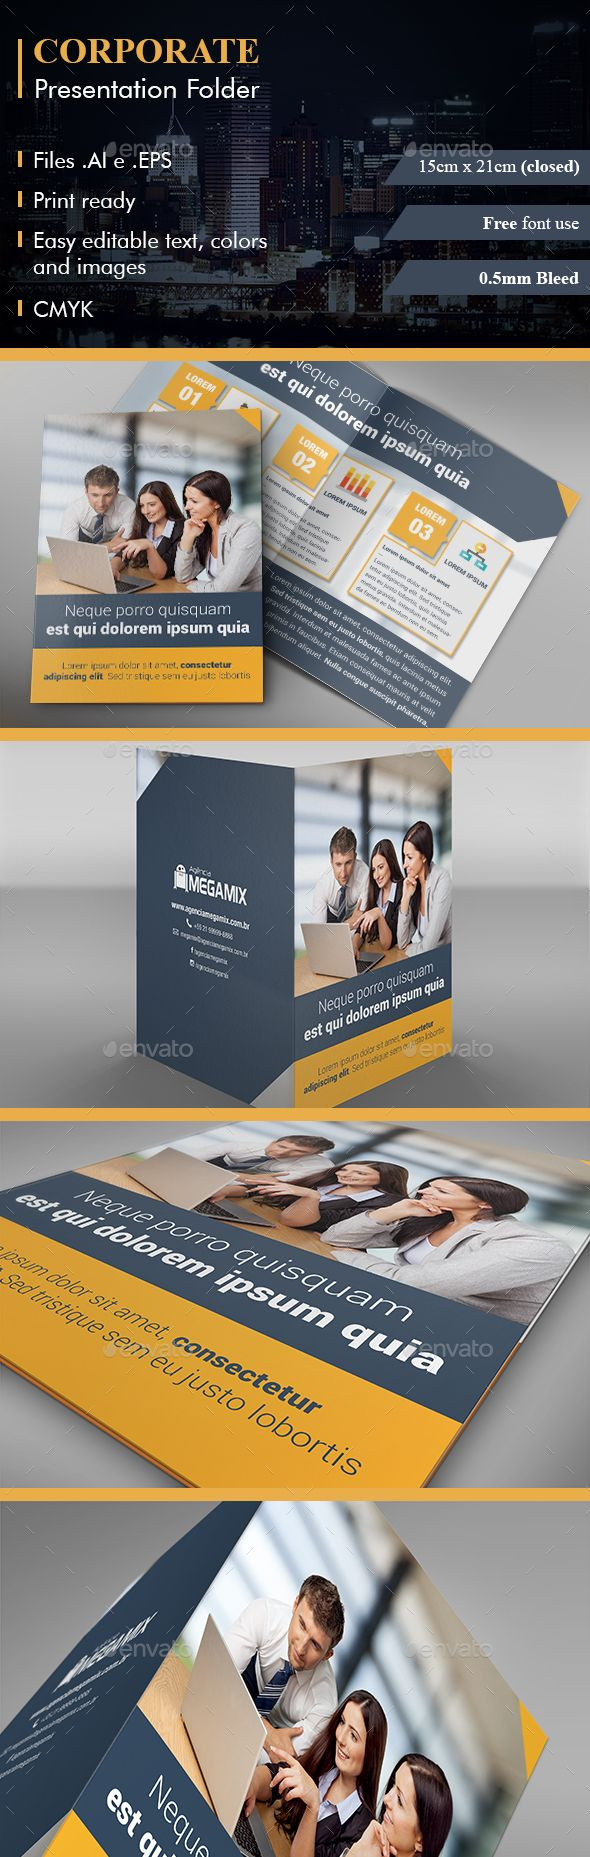 Presentation Folder Corporate Presentation Folder Presentation Business Card Template Design